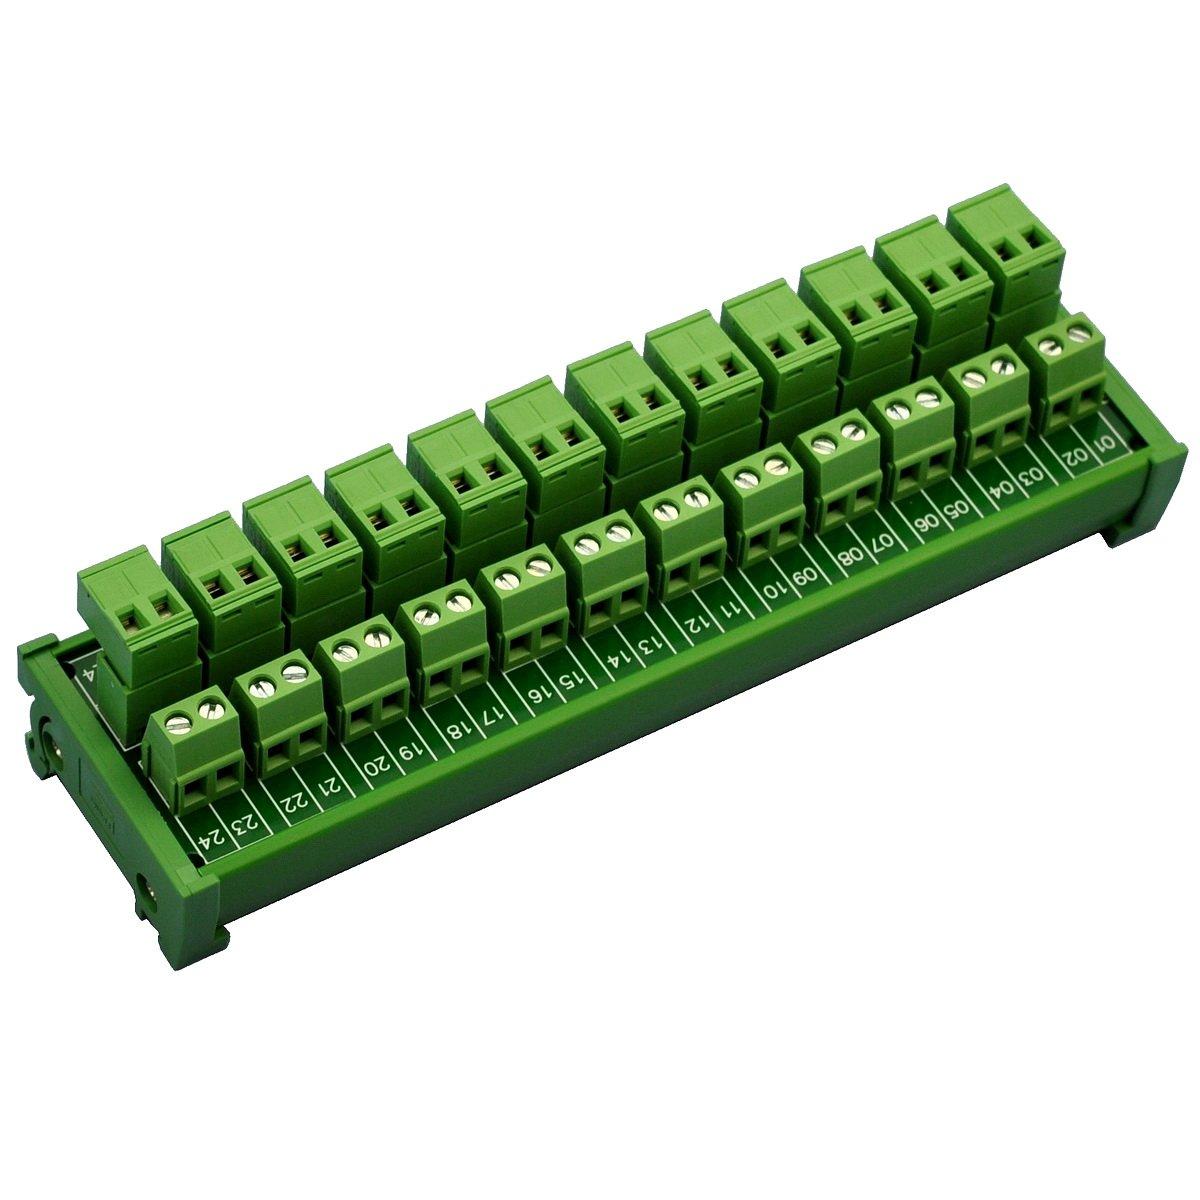 Electronics-Salon DIN Rail Mount Pluggable 12x2 Position 10A / 300V Screw Terminal Block Distribution Module. (Top Wire Connects) by Electronics-Salon